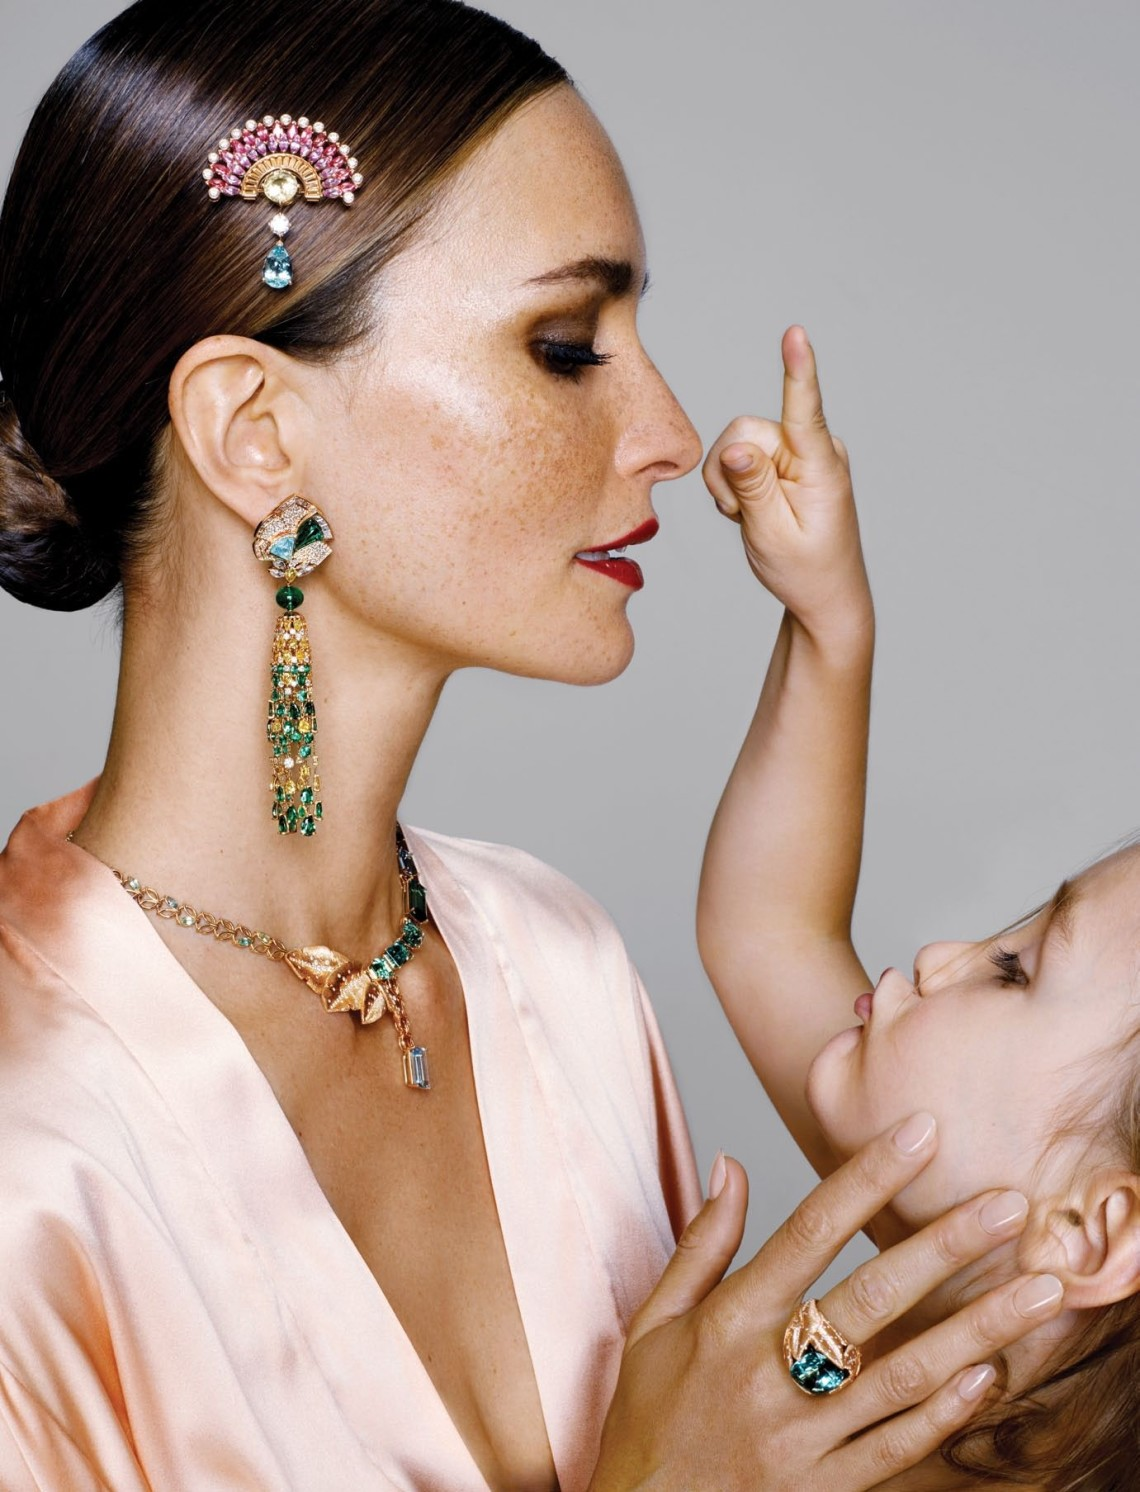 Brooch (in hair); earring; necklace; ring, Piaget. Robe, La Perla